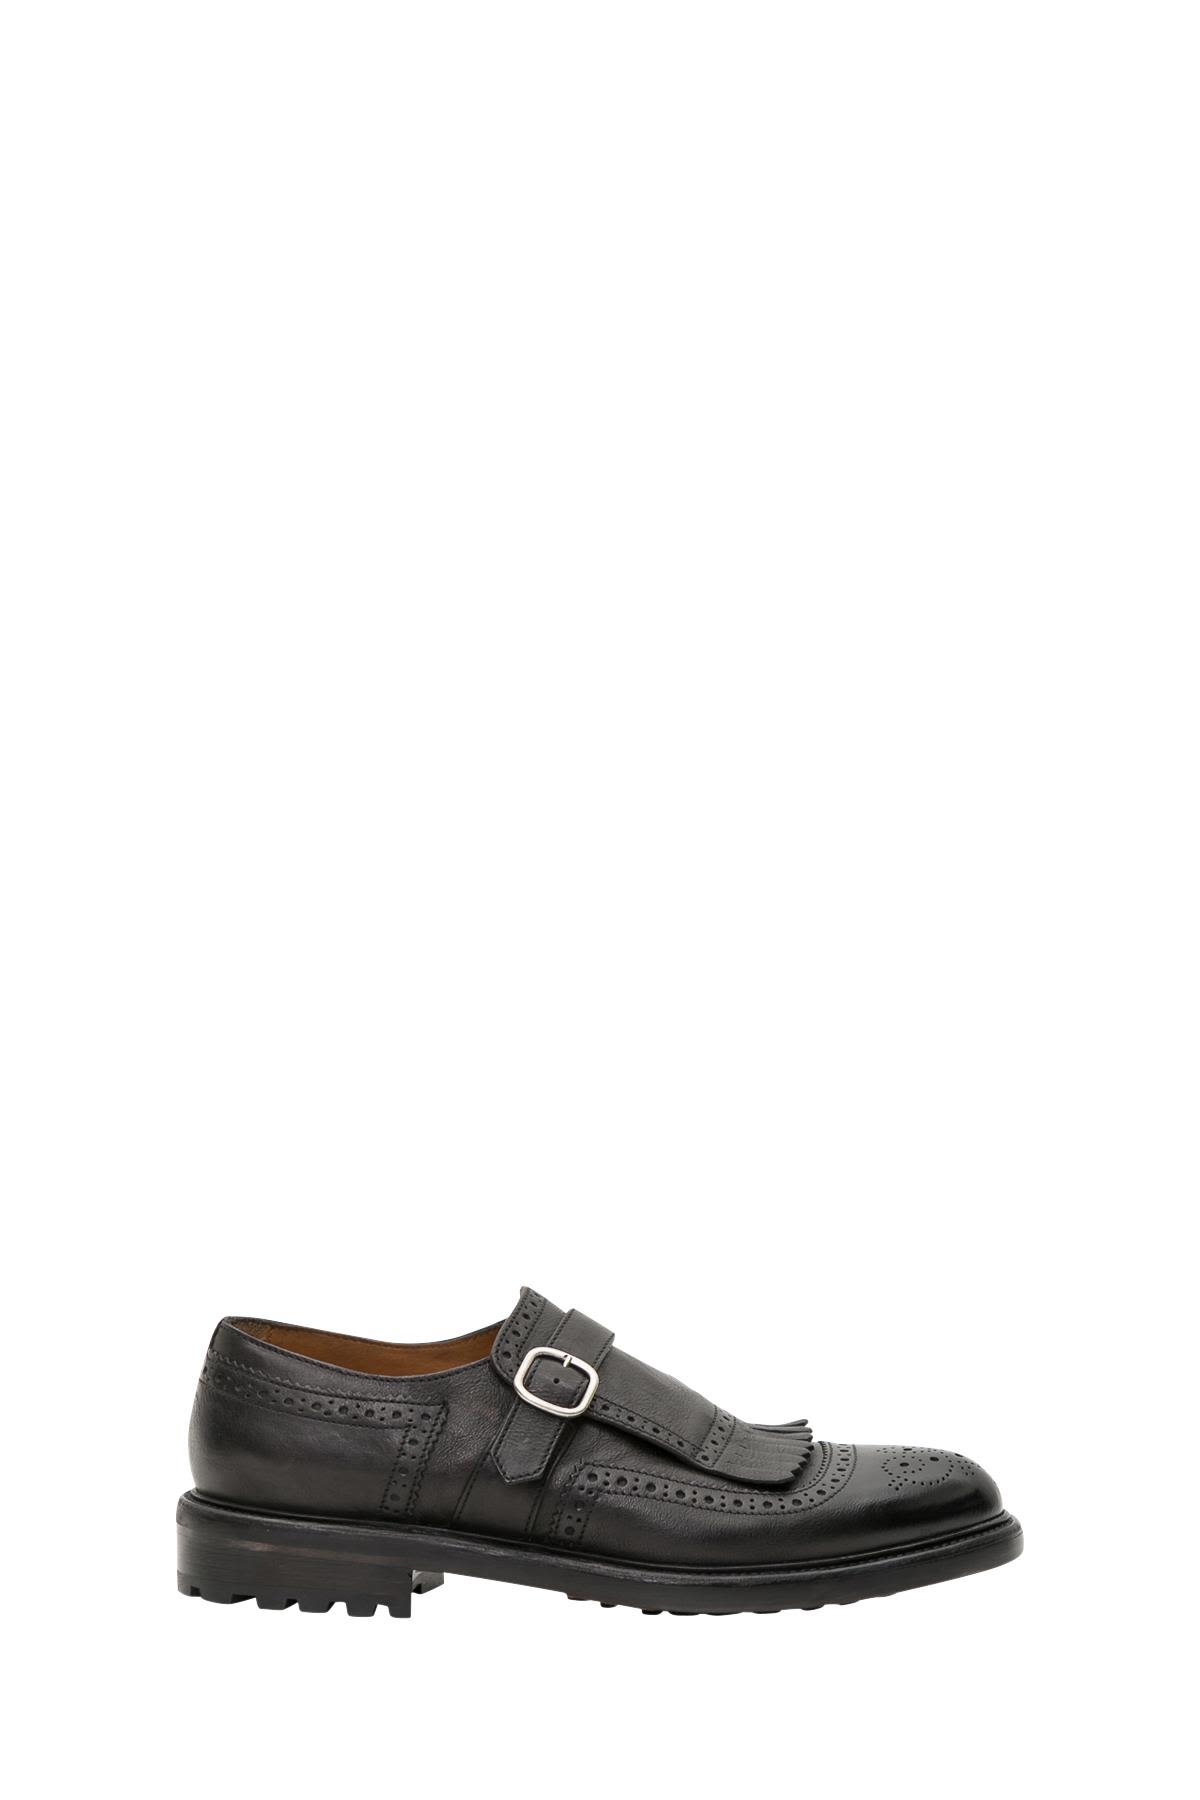 Doucal's Monk Strap Derby Shoes